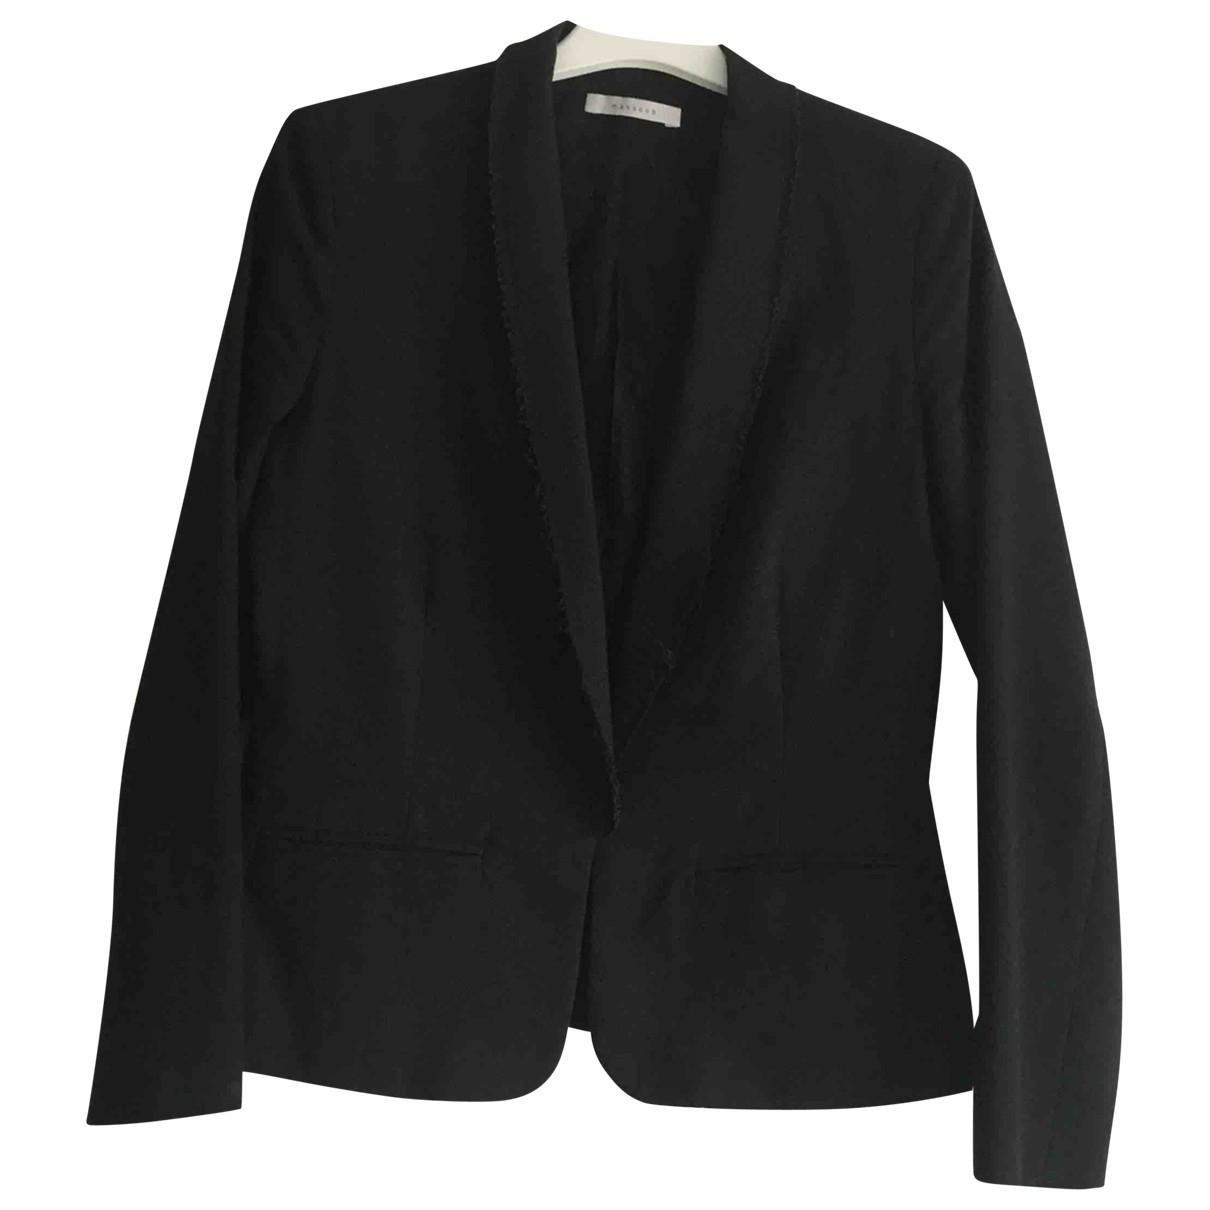 Masscob \N Black Cotton jacket for Women 36 FR